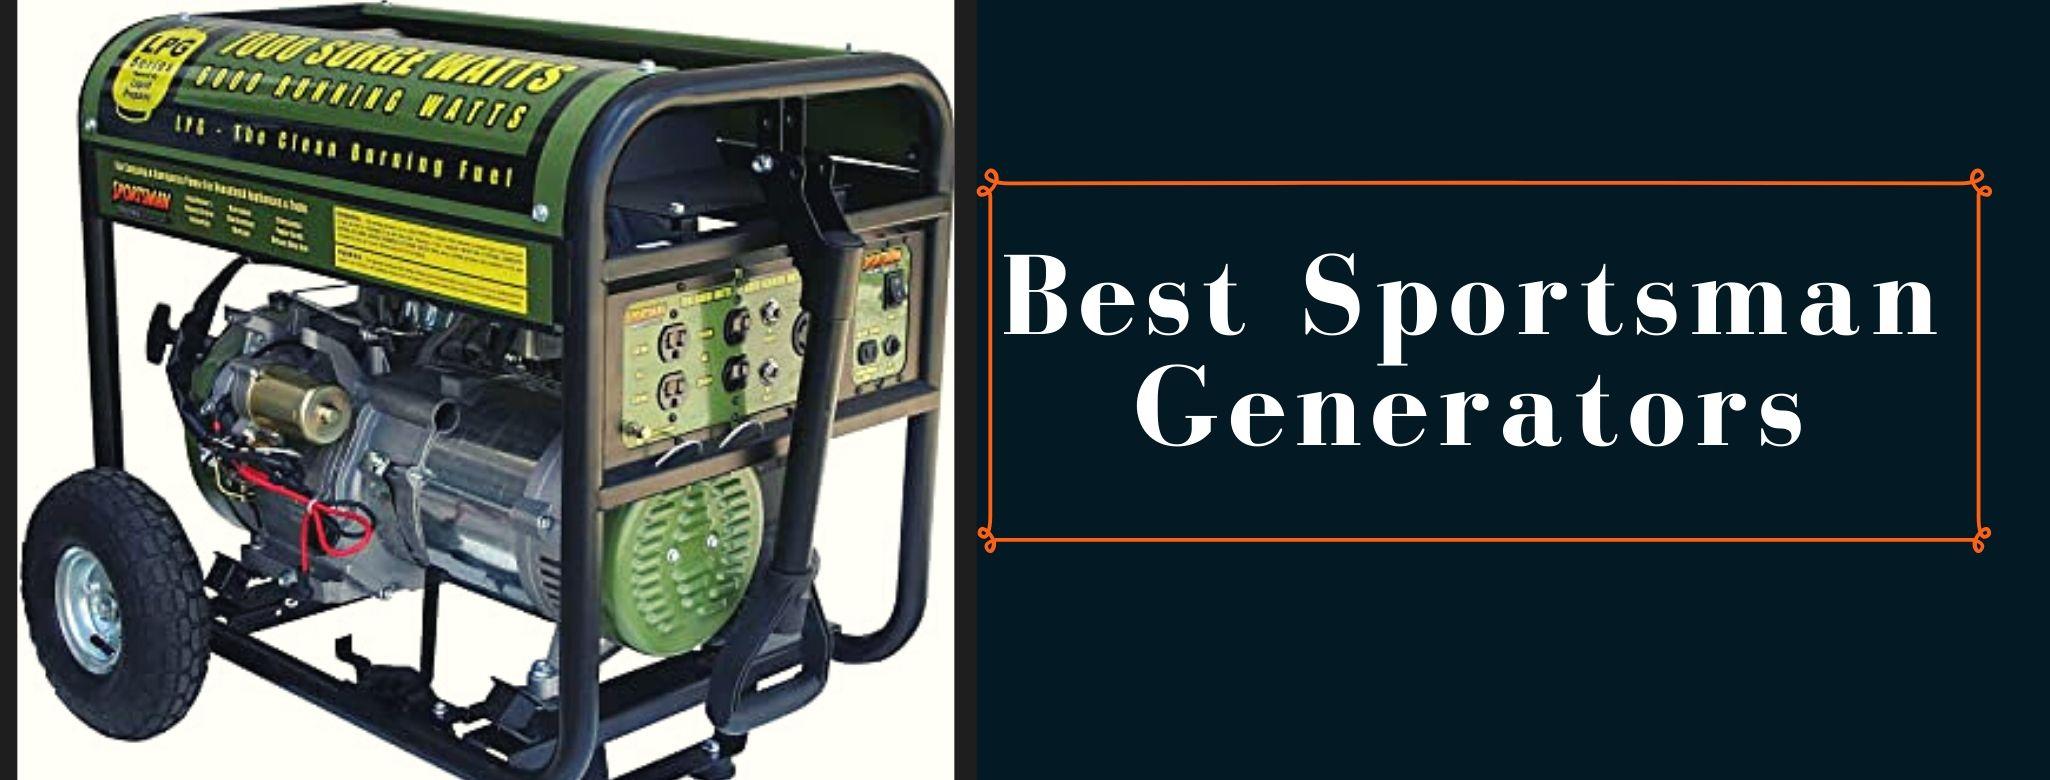 Sportsman inverter, propane, portable generators